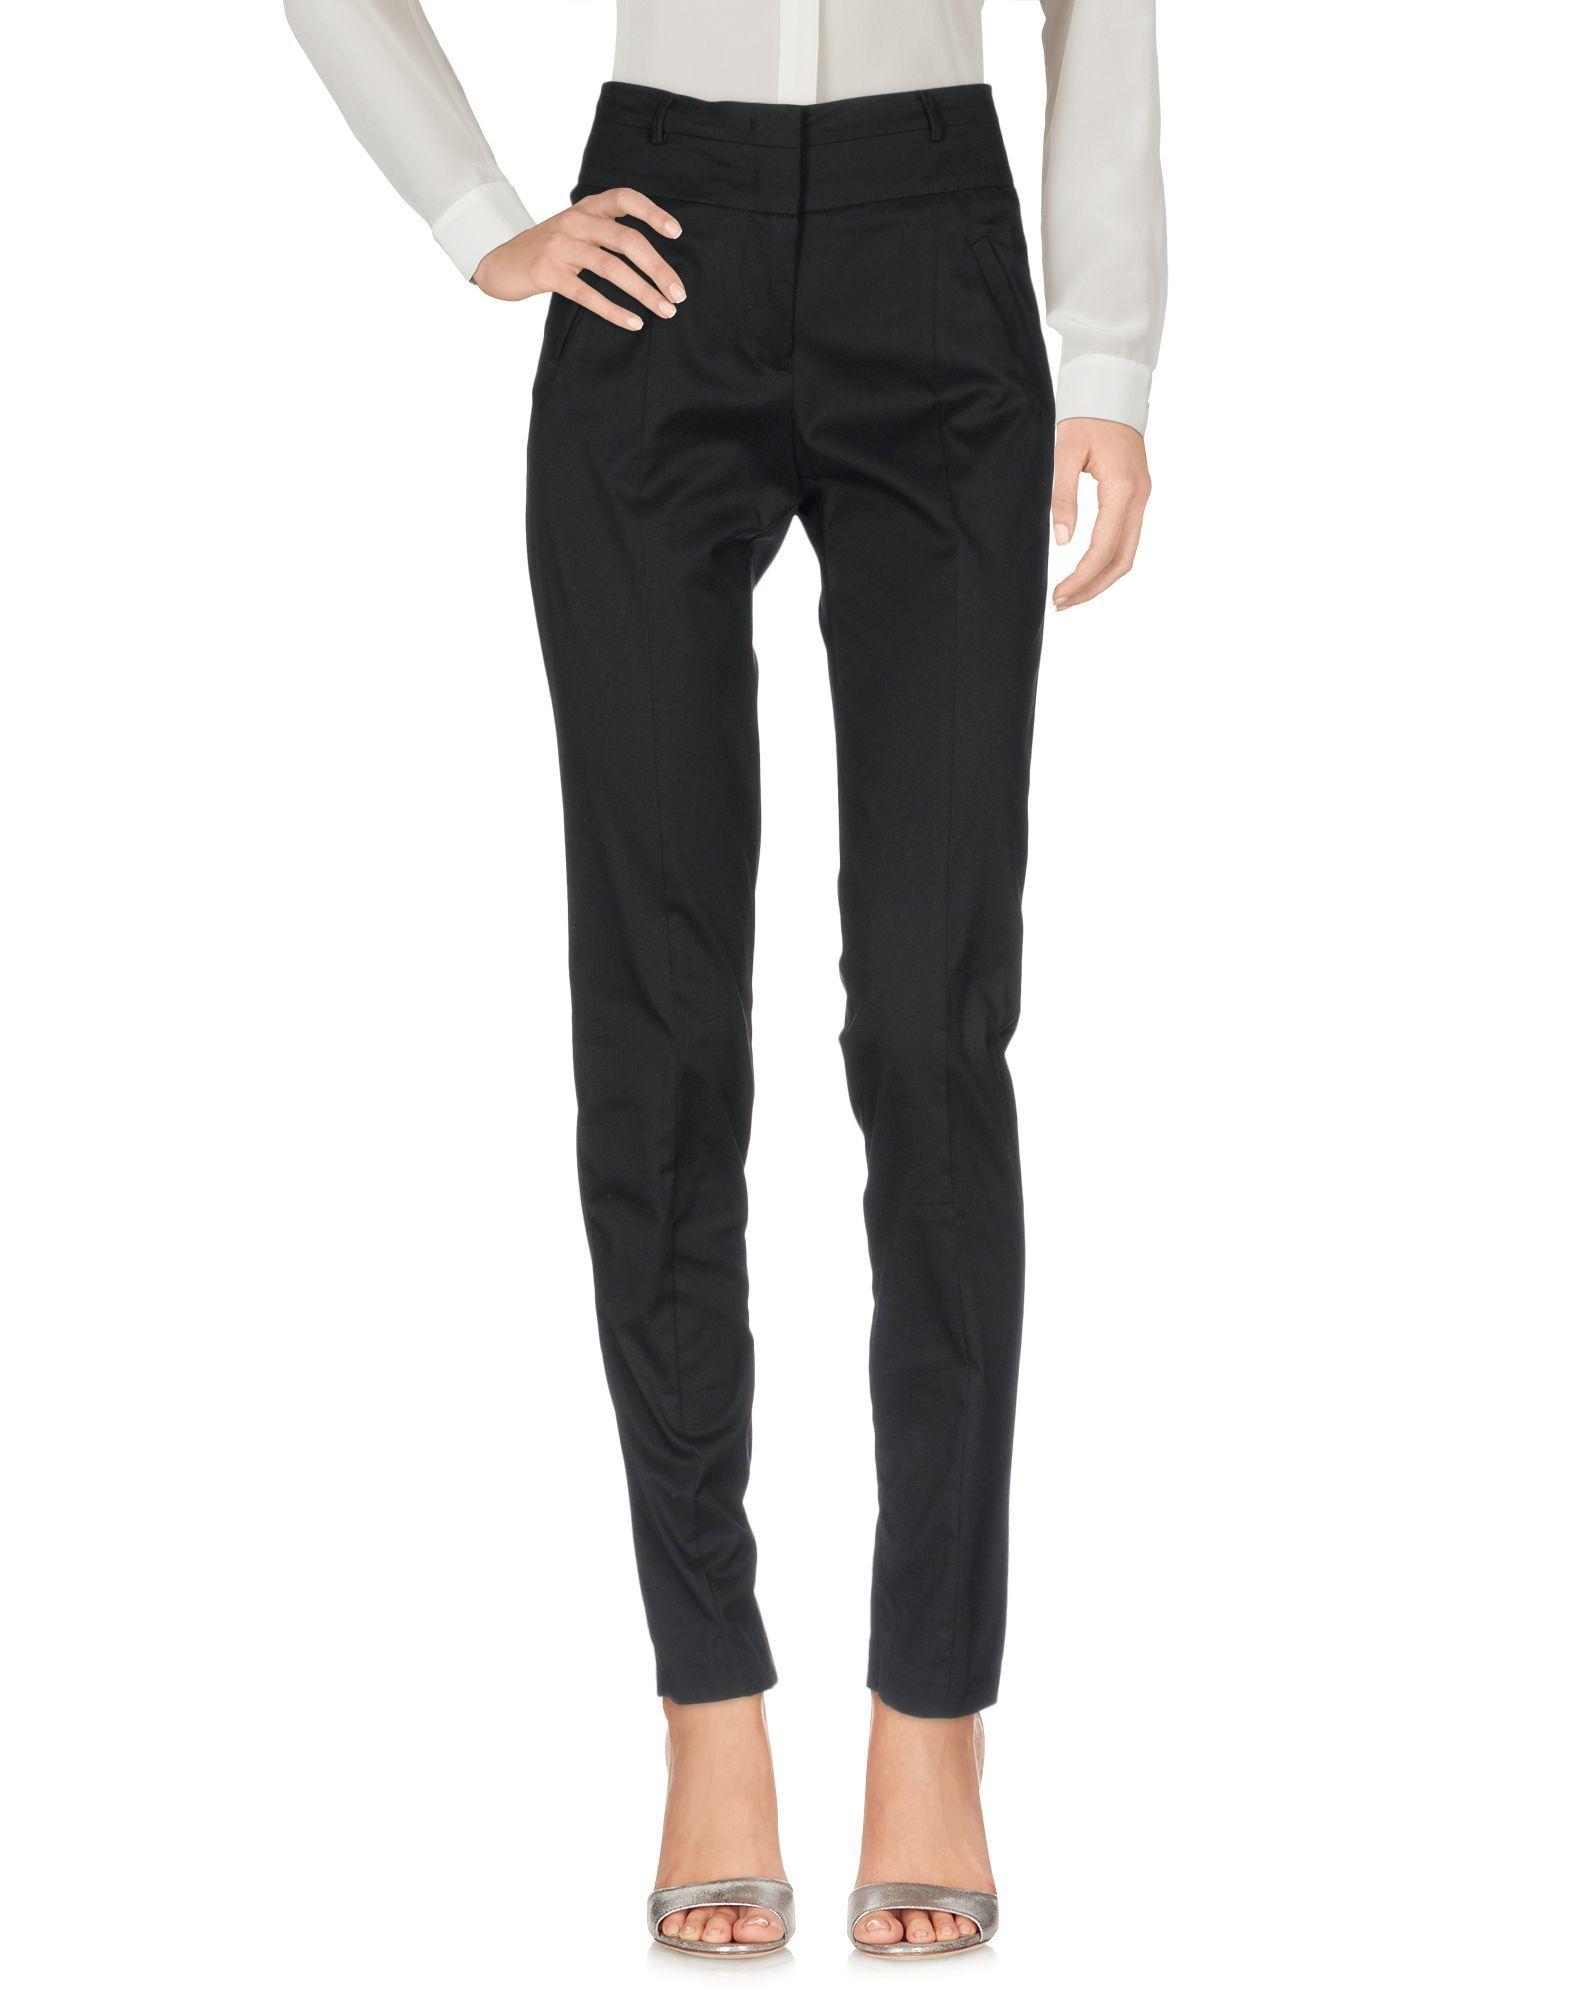 awesome ARMANI JEANS Damen Hose Farbe Schwarz Größe 2